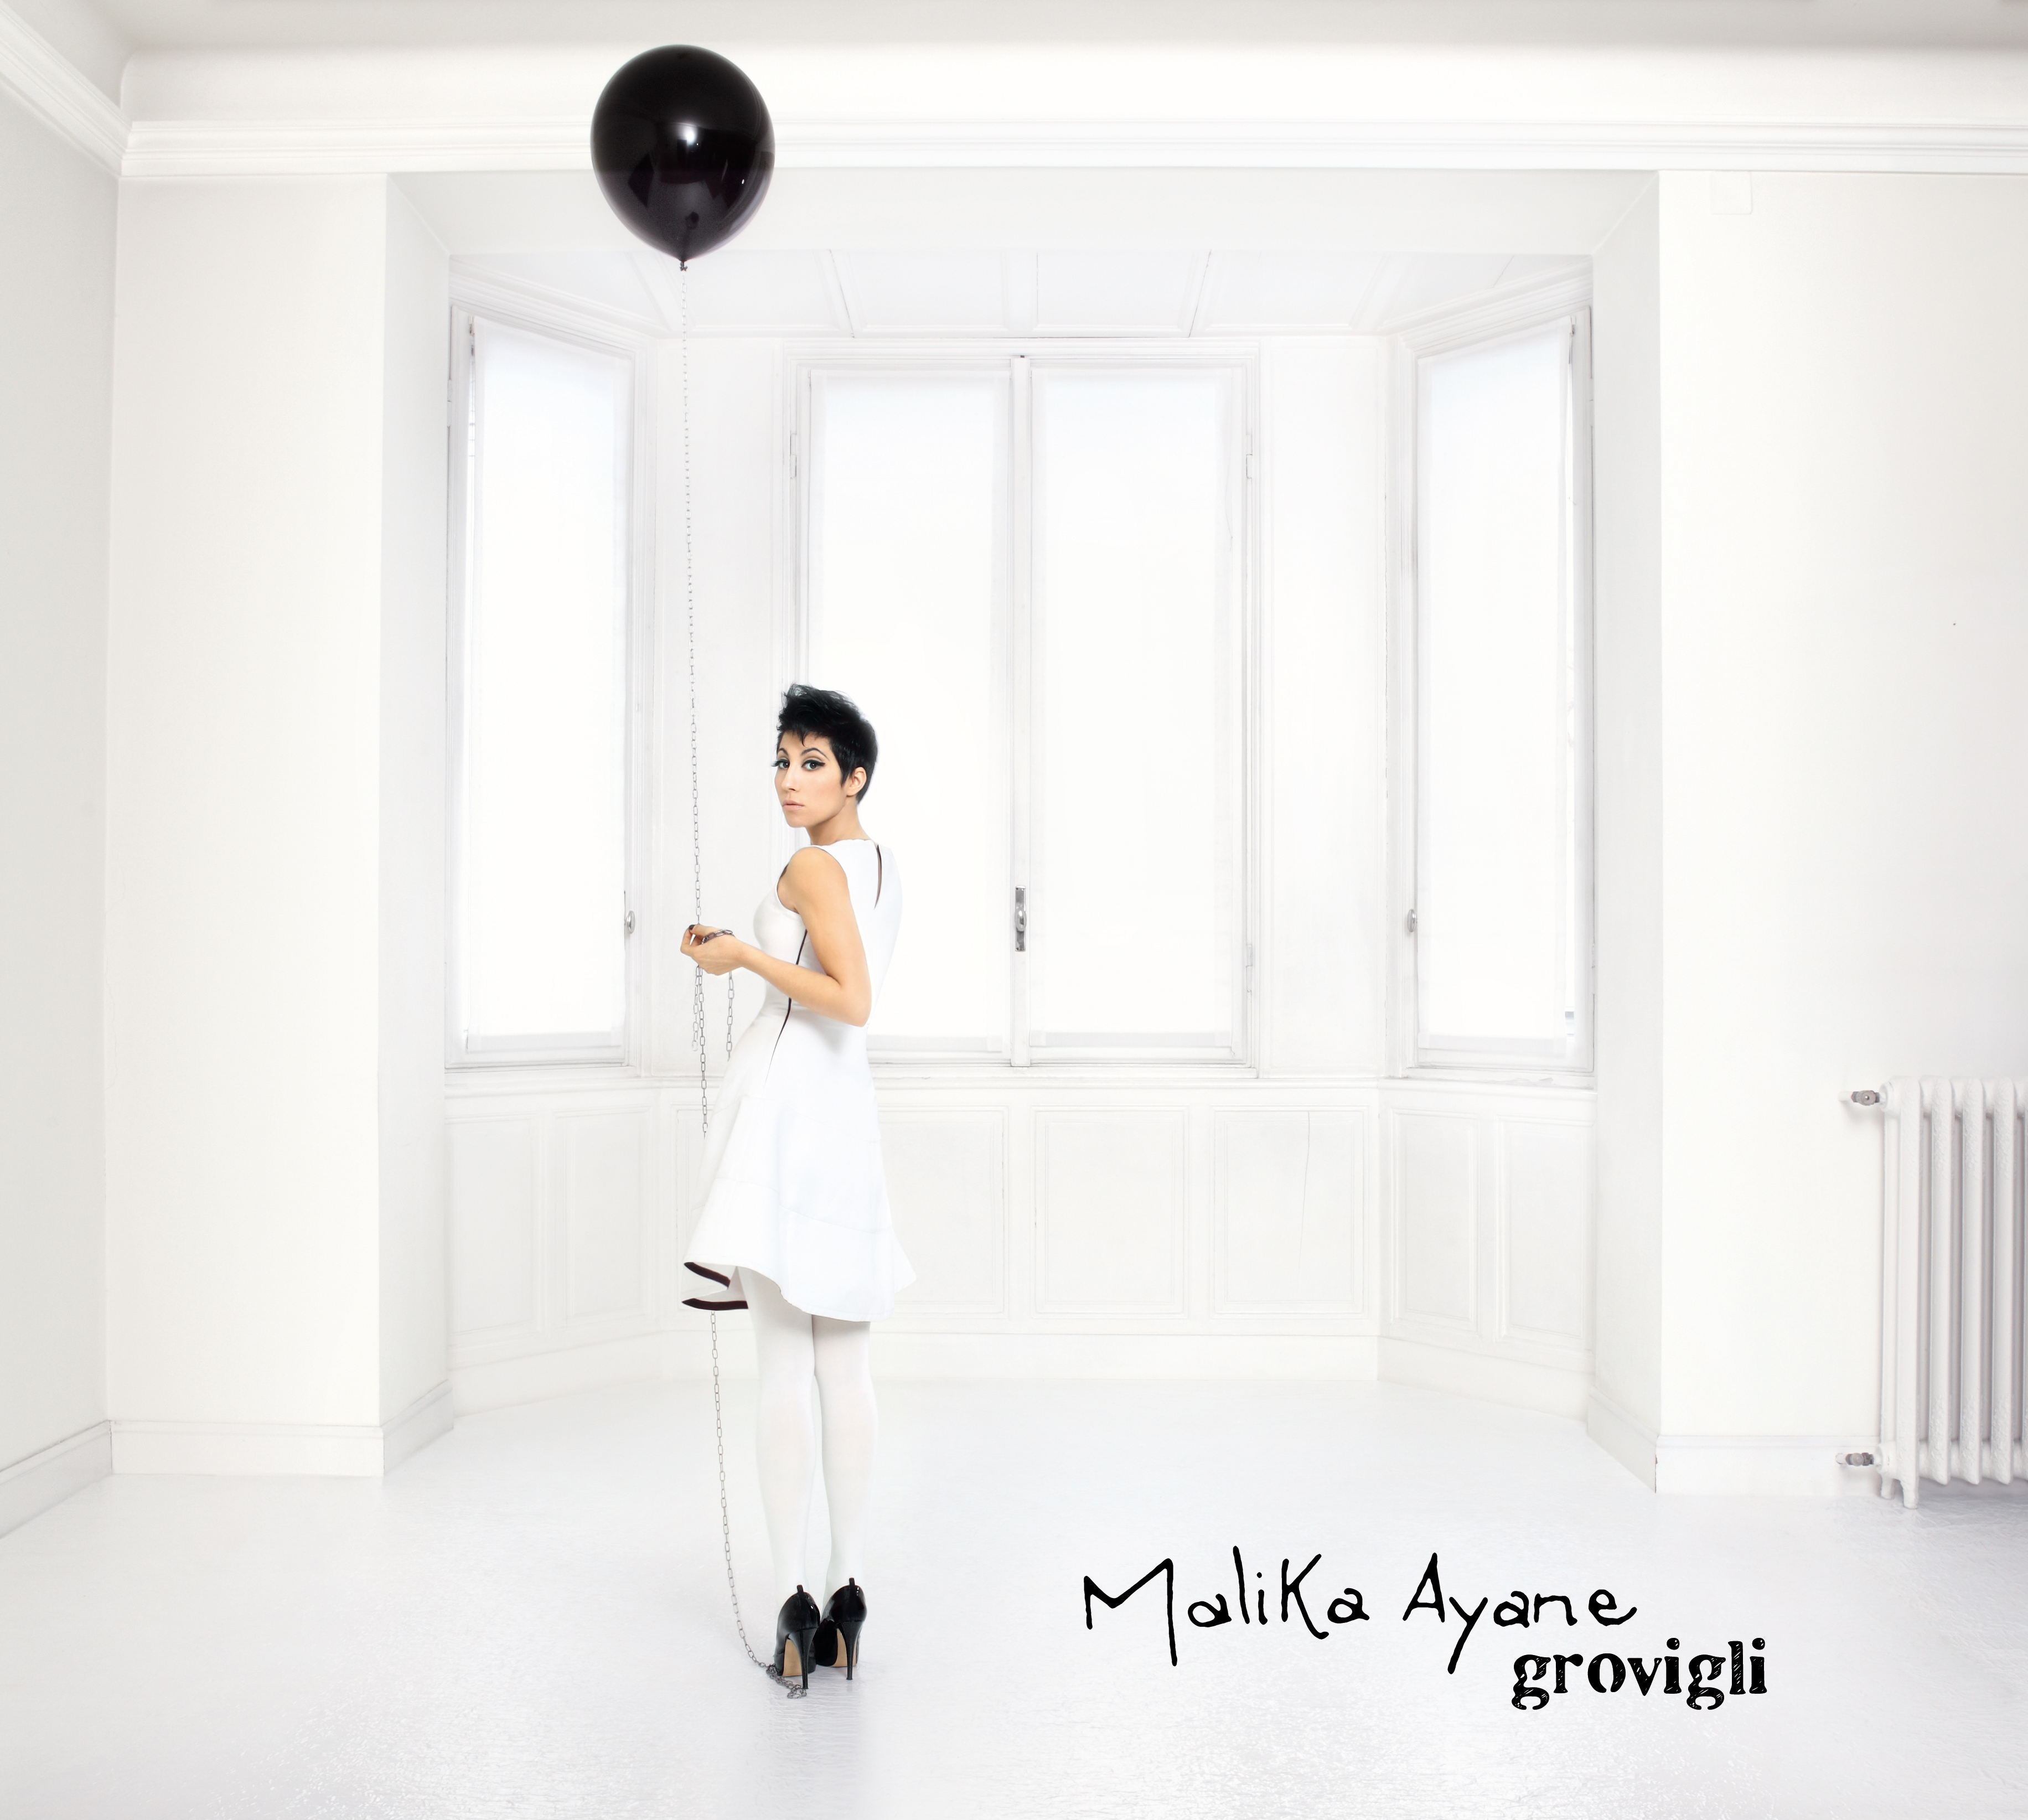 """GROVIGLI"" - Malika Ayane"